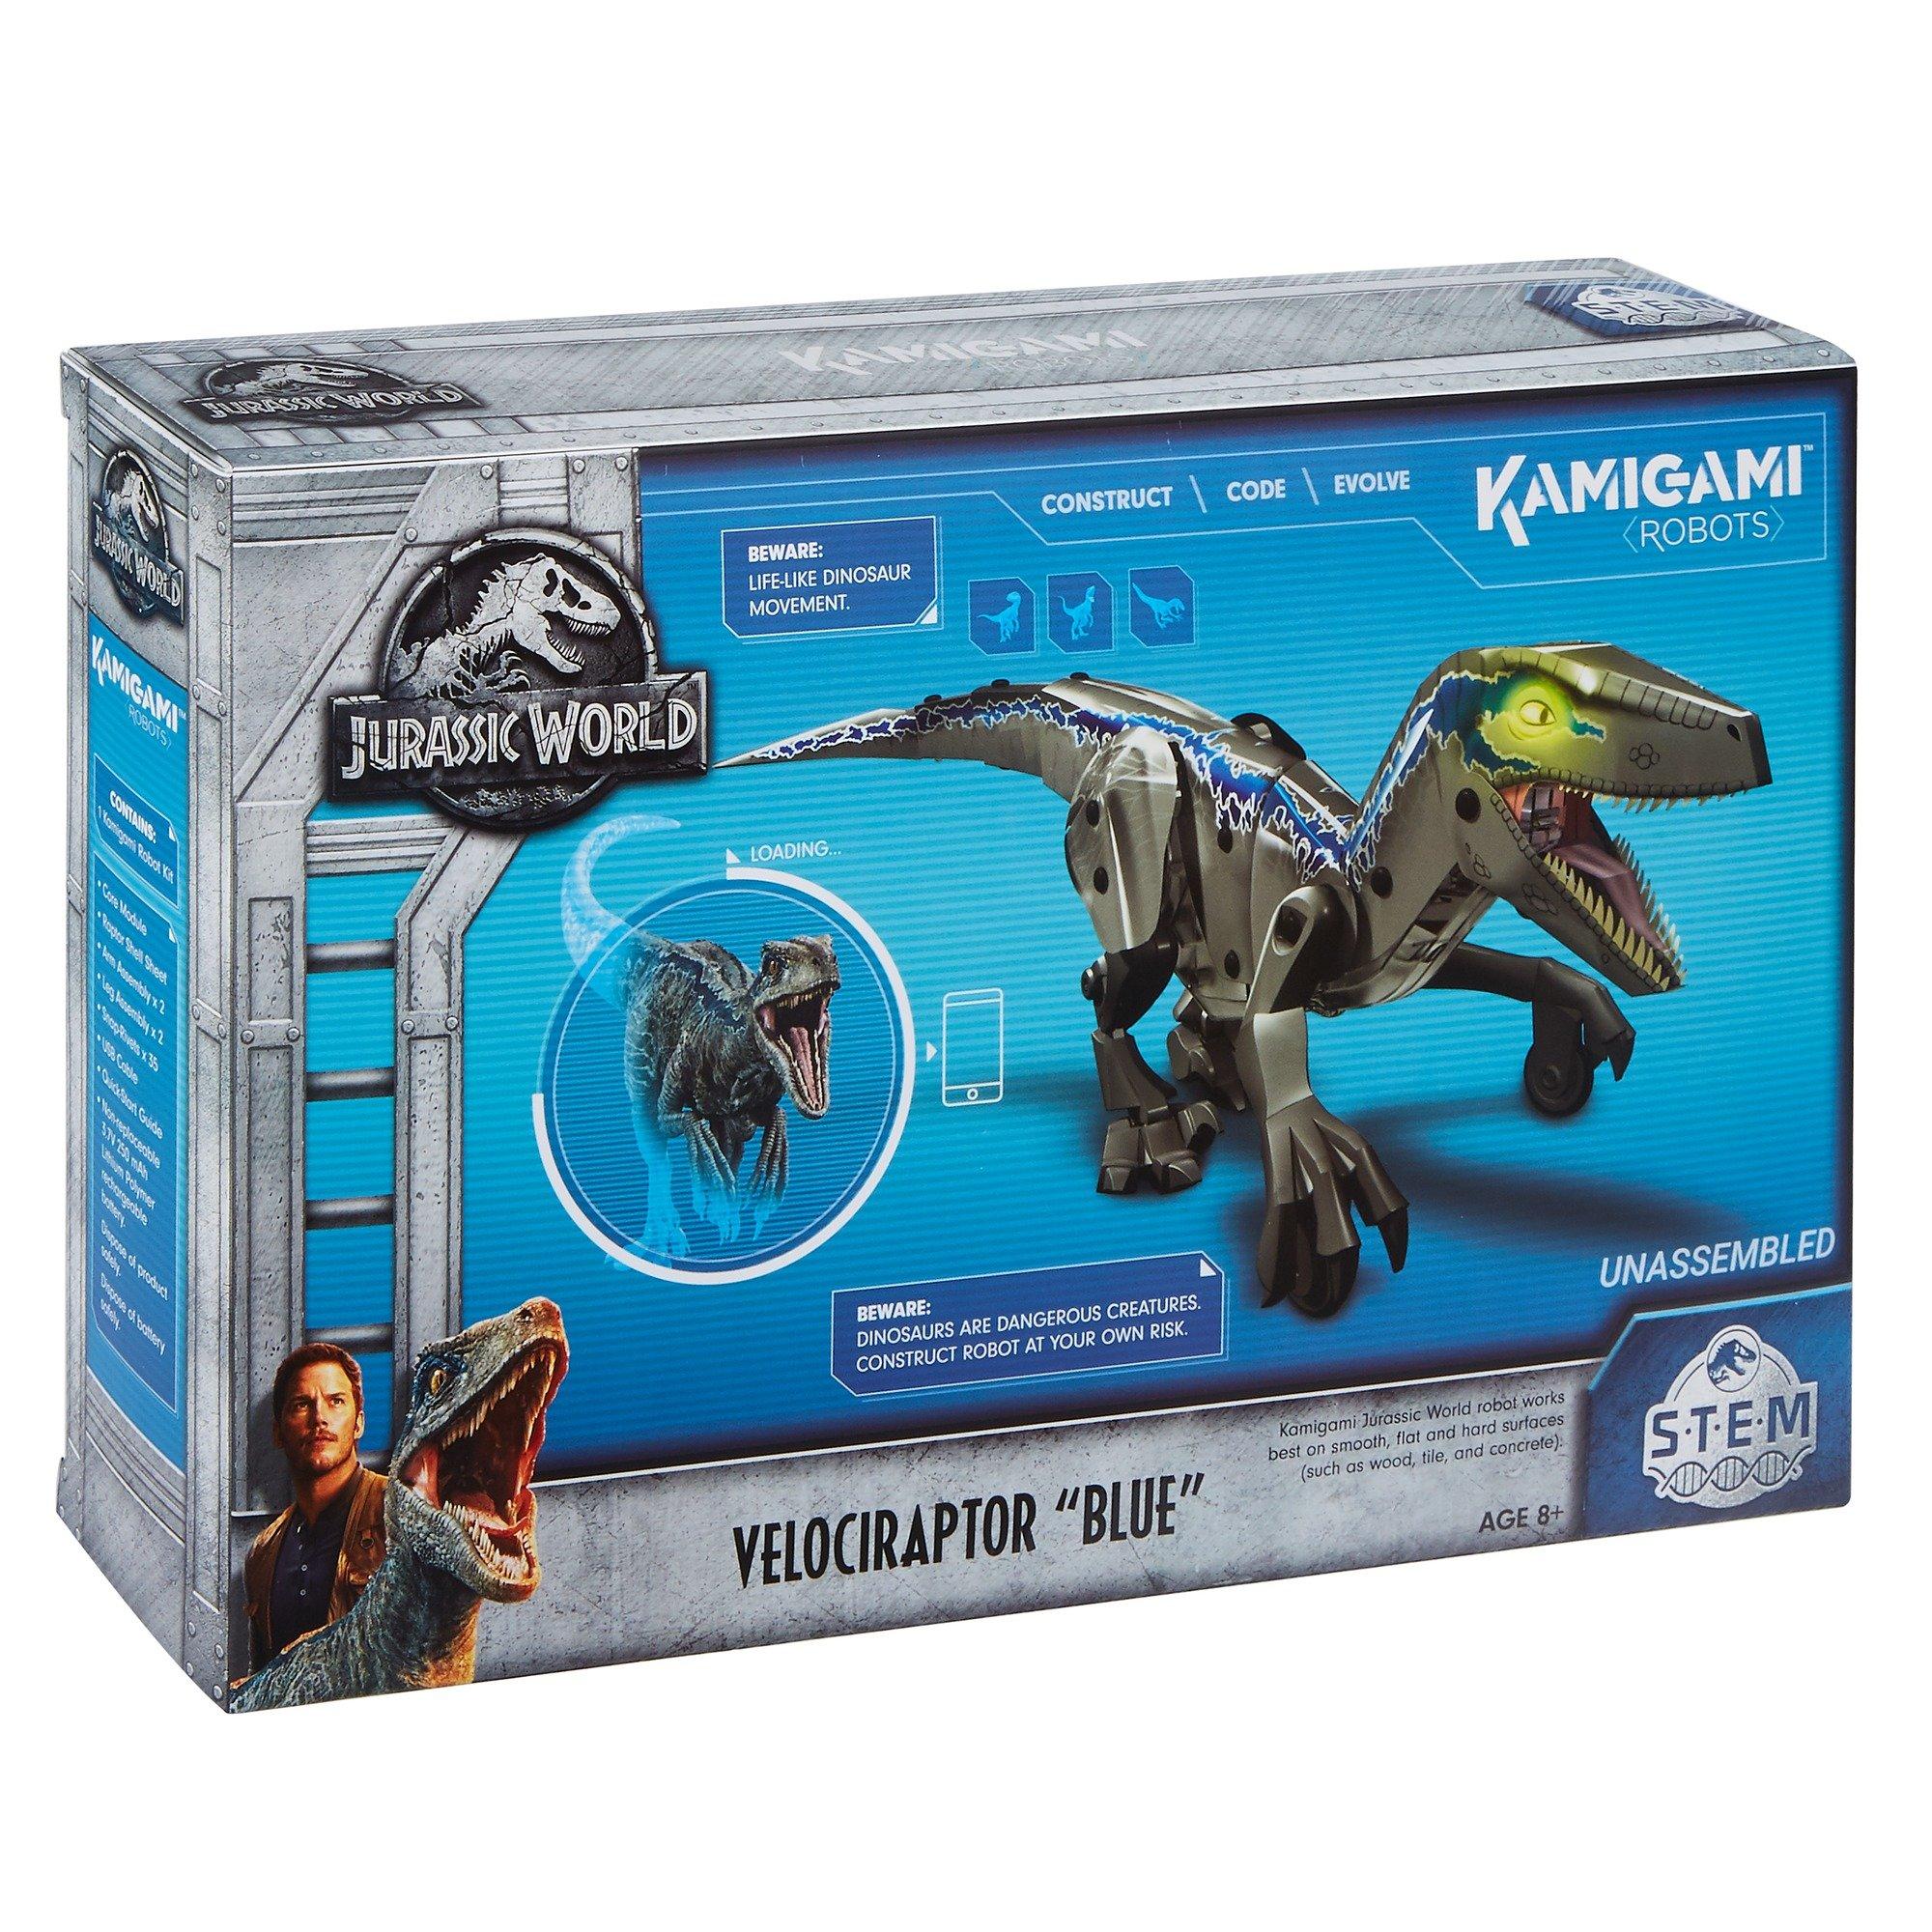 Kamigami Jurassic World Blue Robot by Jurassic World Toys (Image #6)